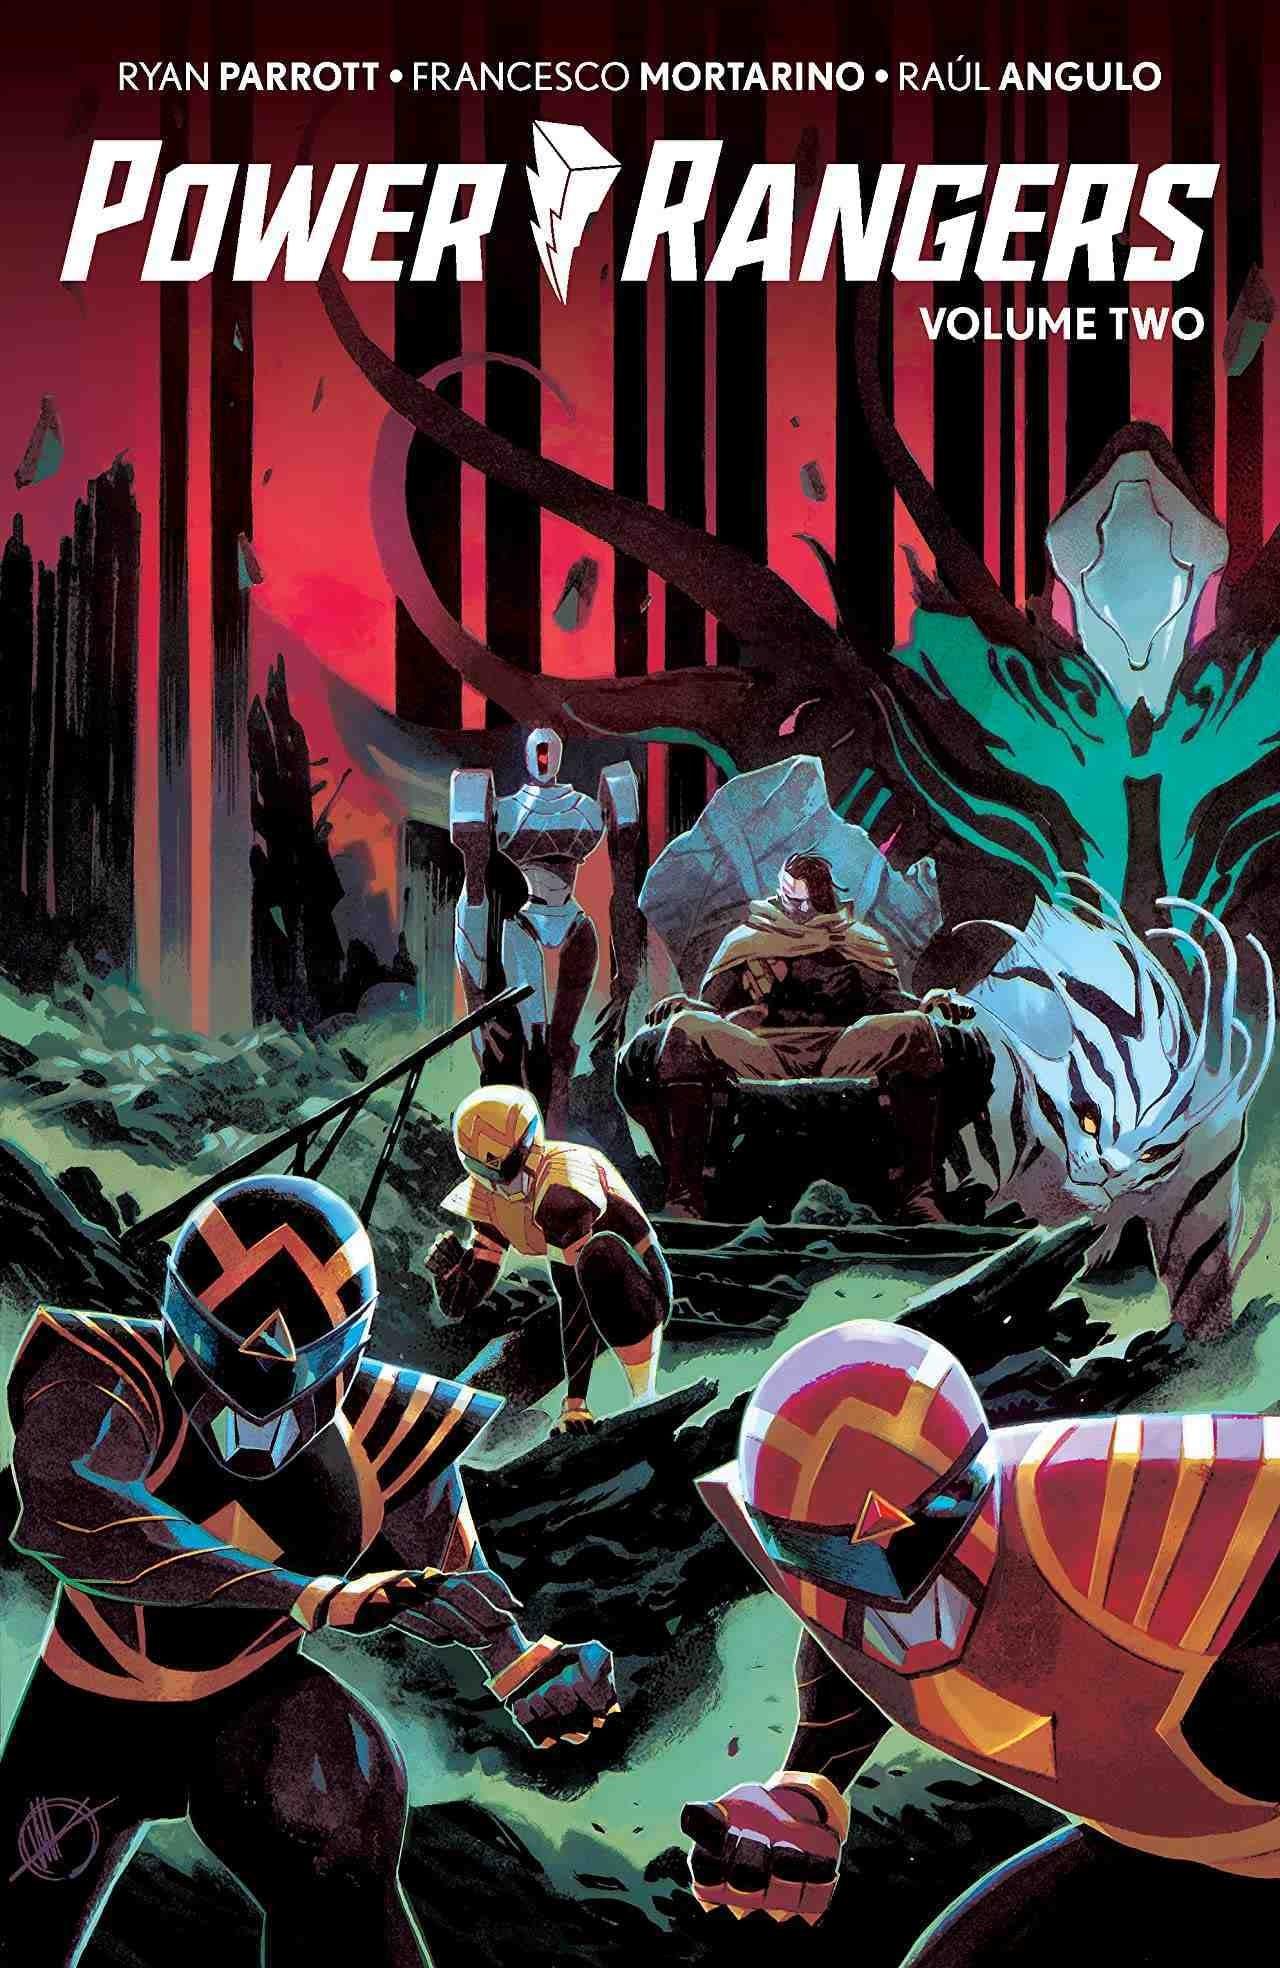 Power Rangers Vol 2